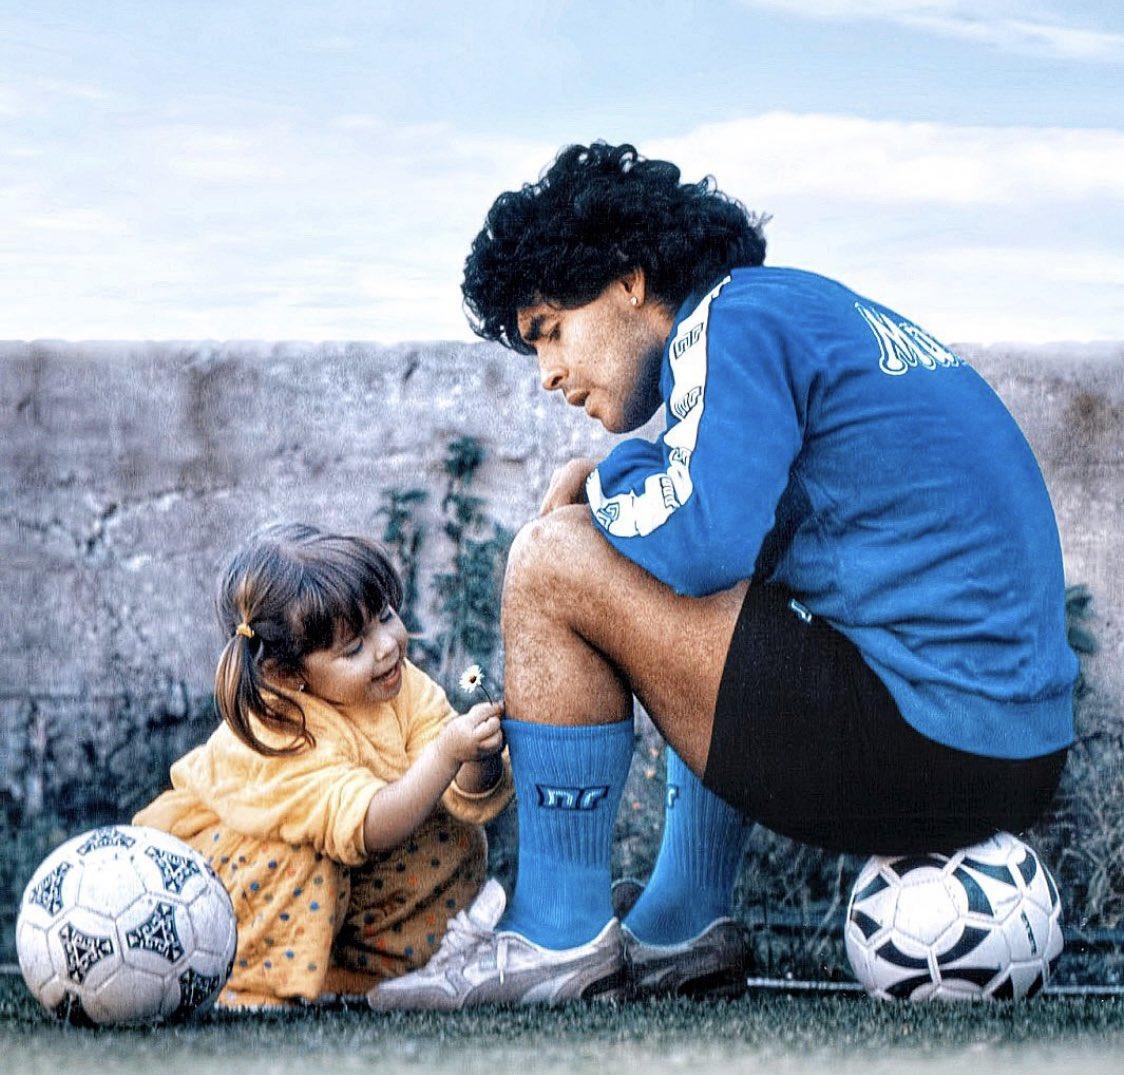 RIP  #Maradona 🙏🙏 https://t.co/1RiEKTm8zj